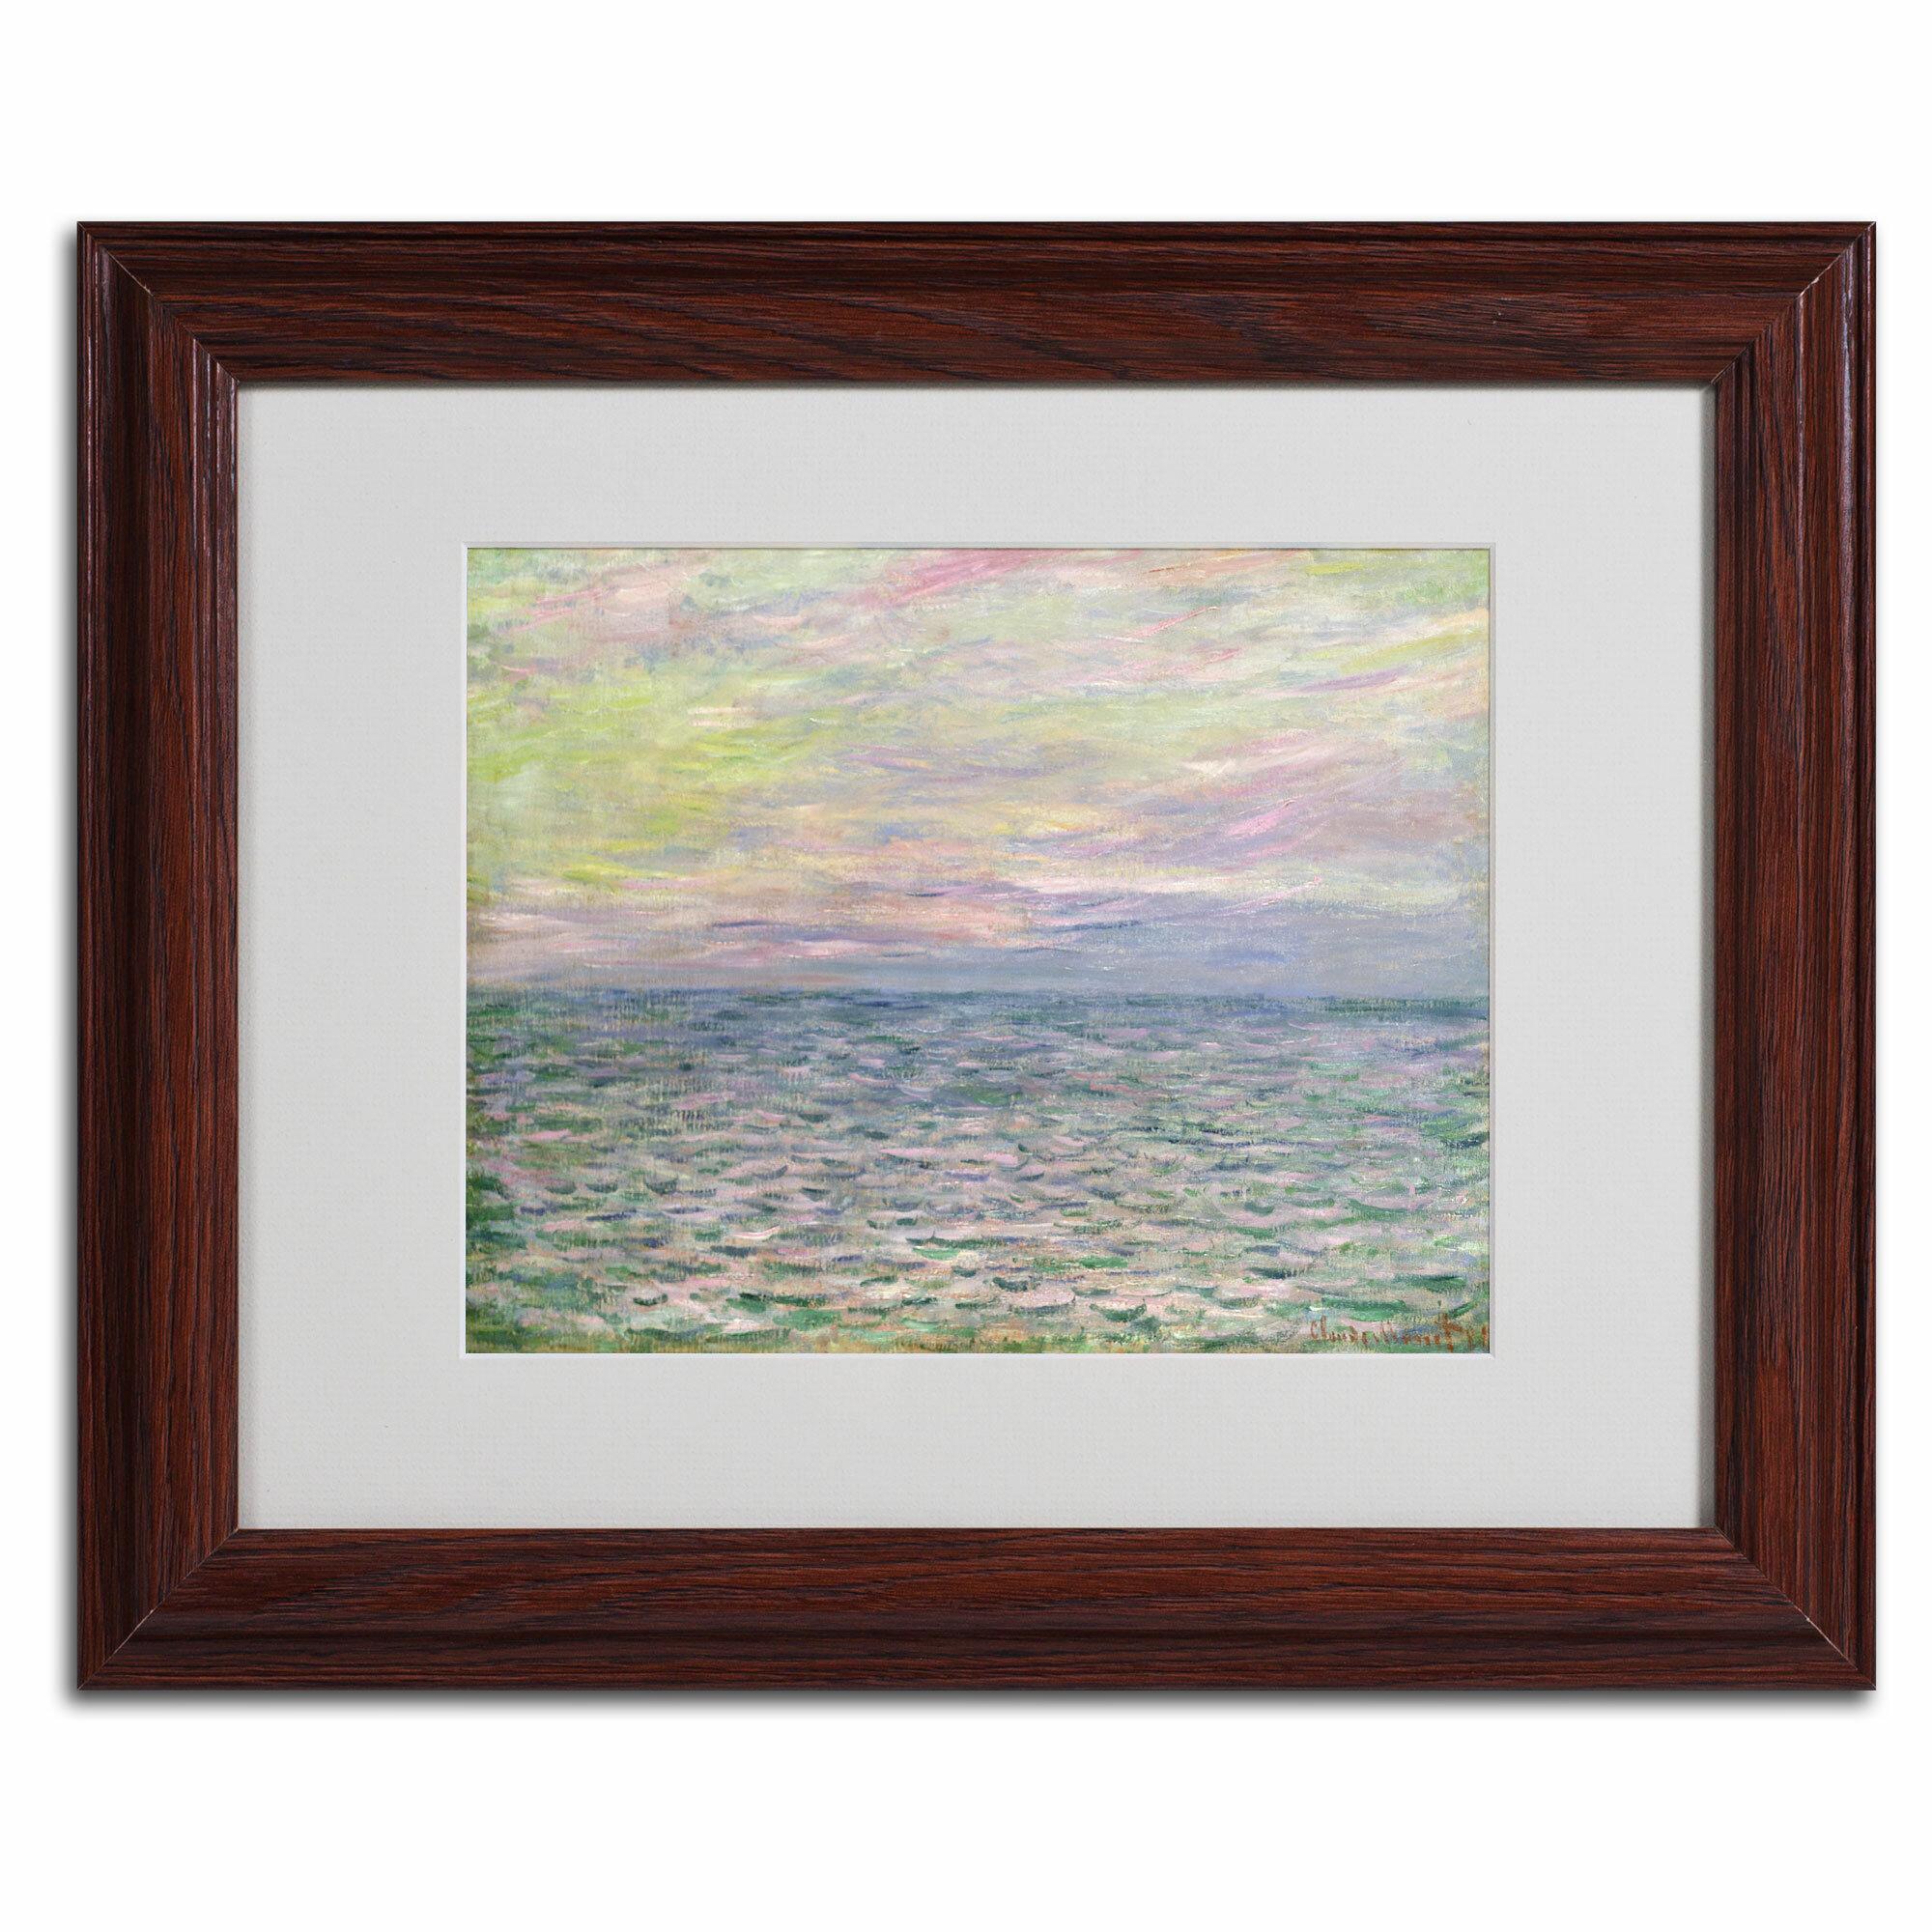 Vault W Artwork Coucher De Soleil A Pourvil By Claude Monet Matted Framed Painting Print Wayfair